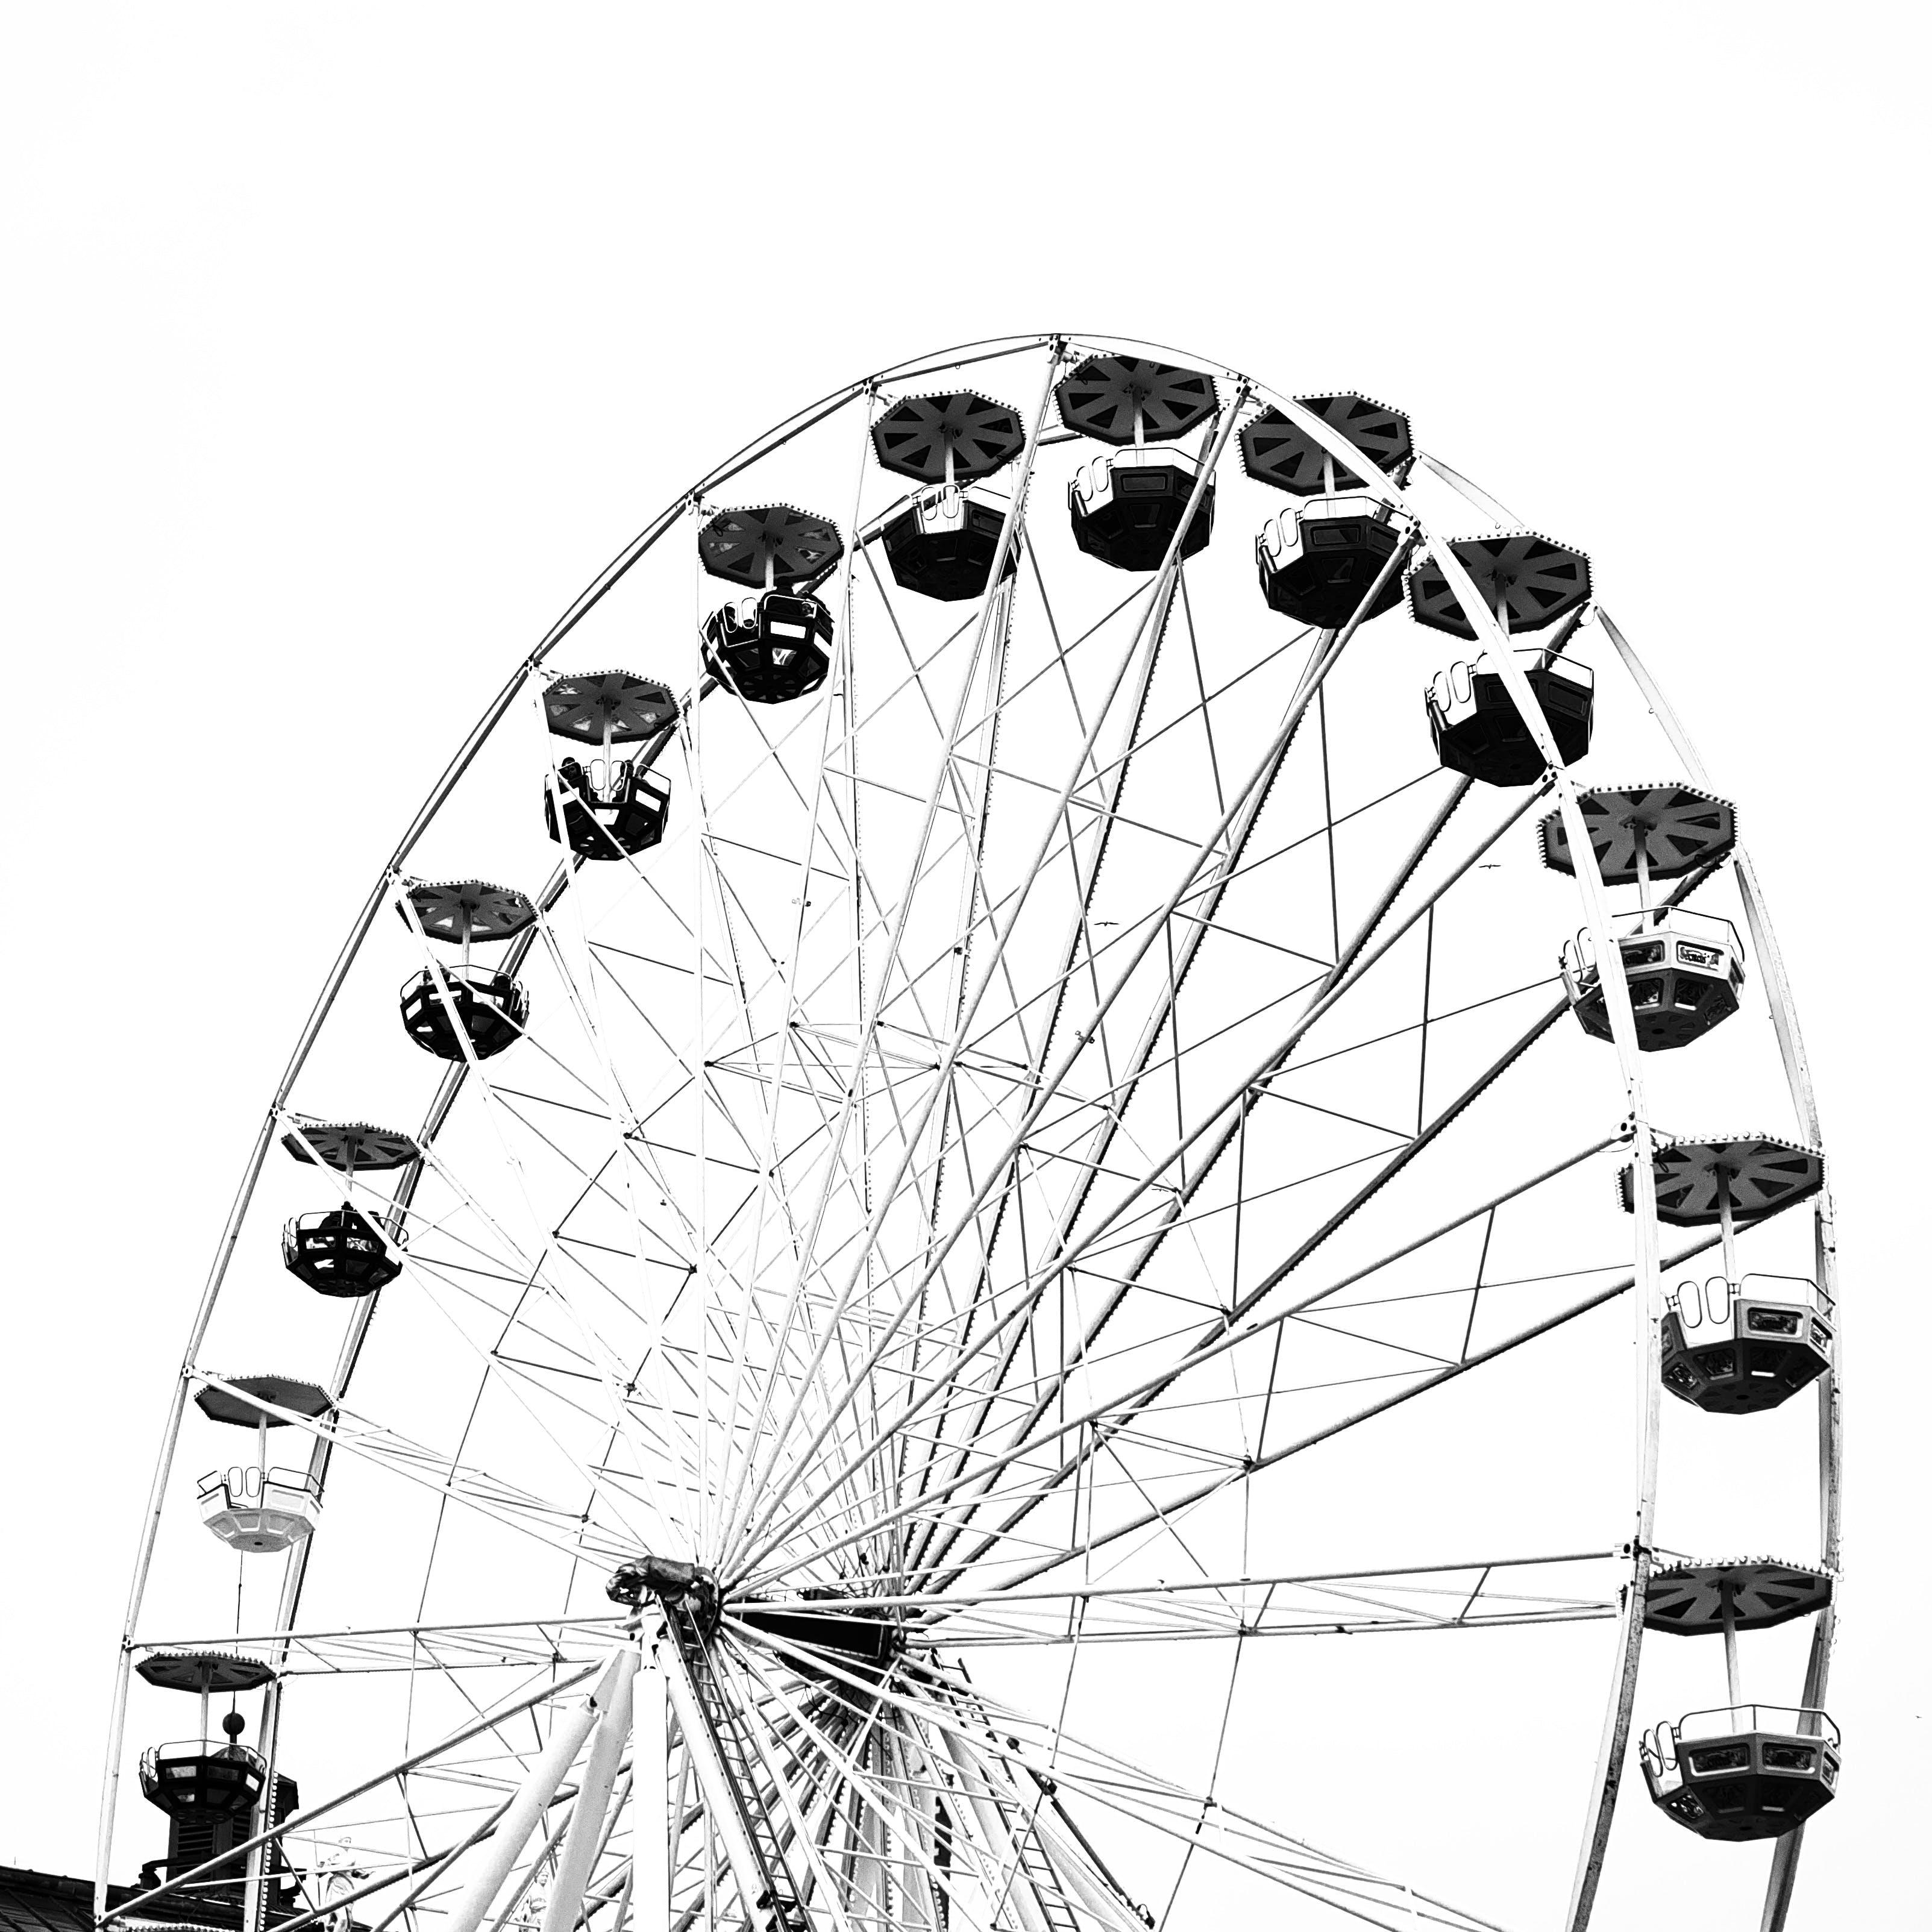 Photography of Ferris Wheel